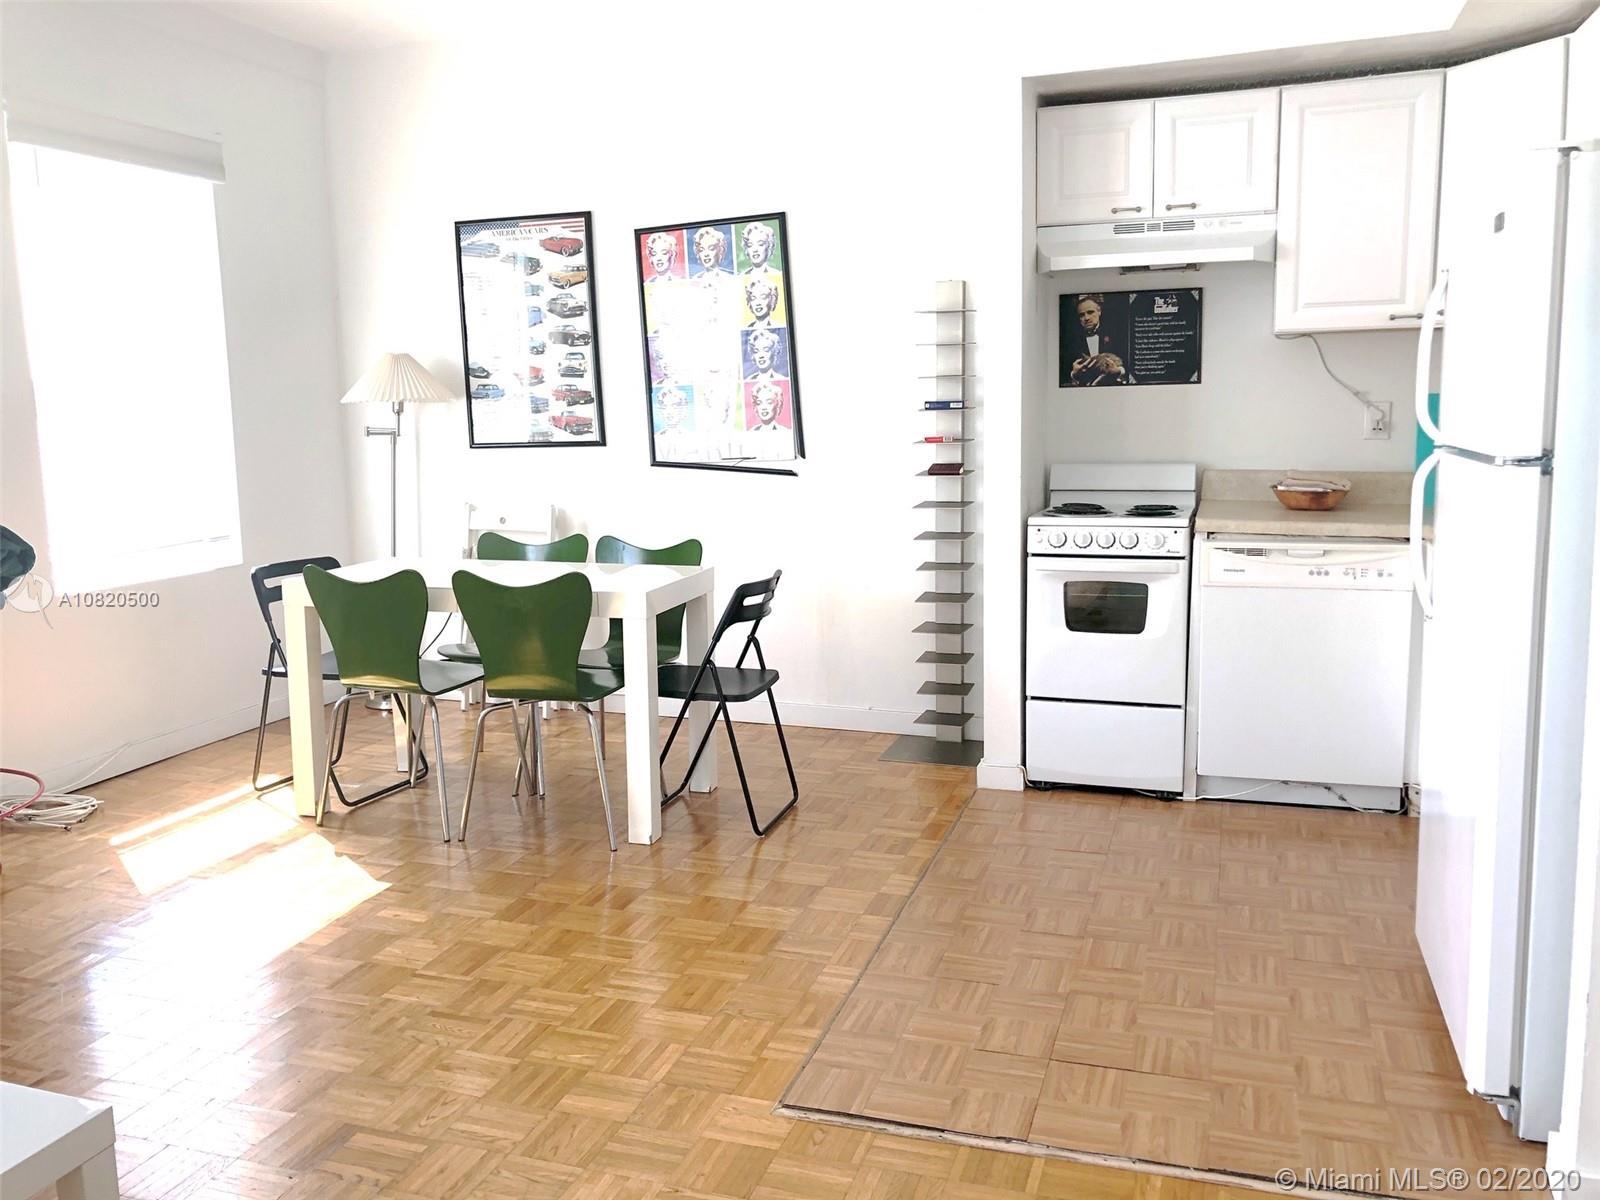 1218 Drexel Ave #306, Miami Beach, FL 33139 - Miami Beach, FL real estate listing